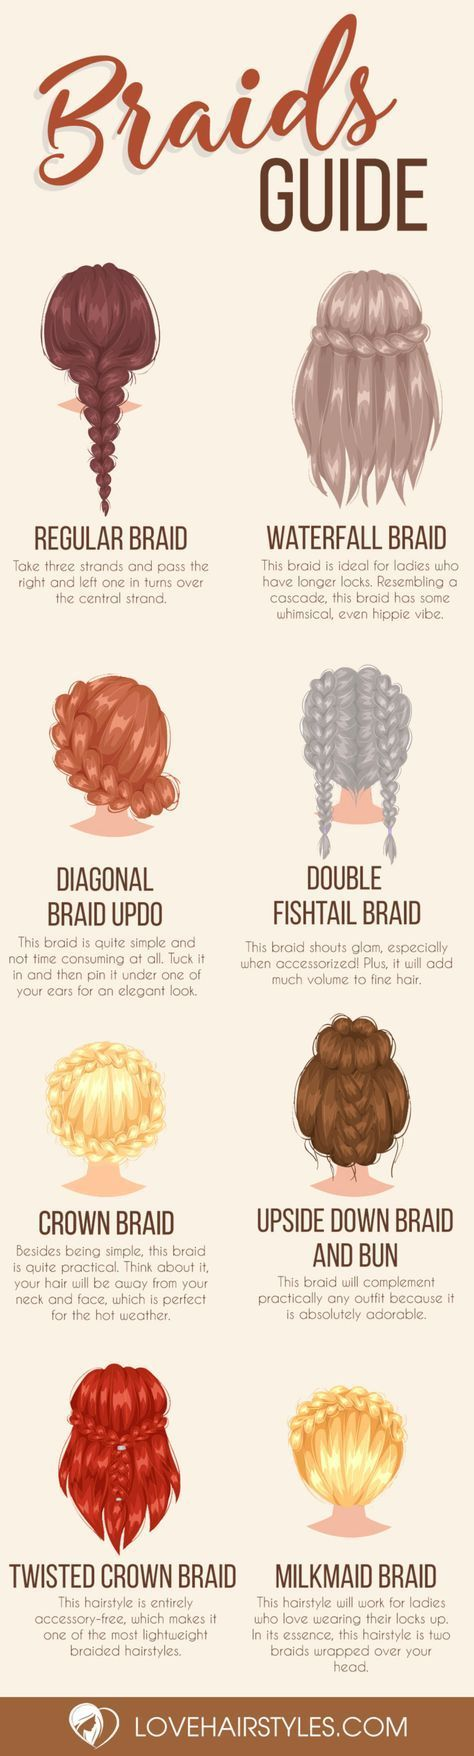 charming braided hairstyles makeup hair u nails pinterest